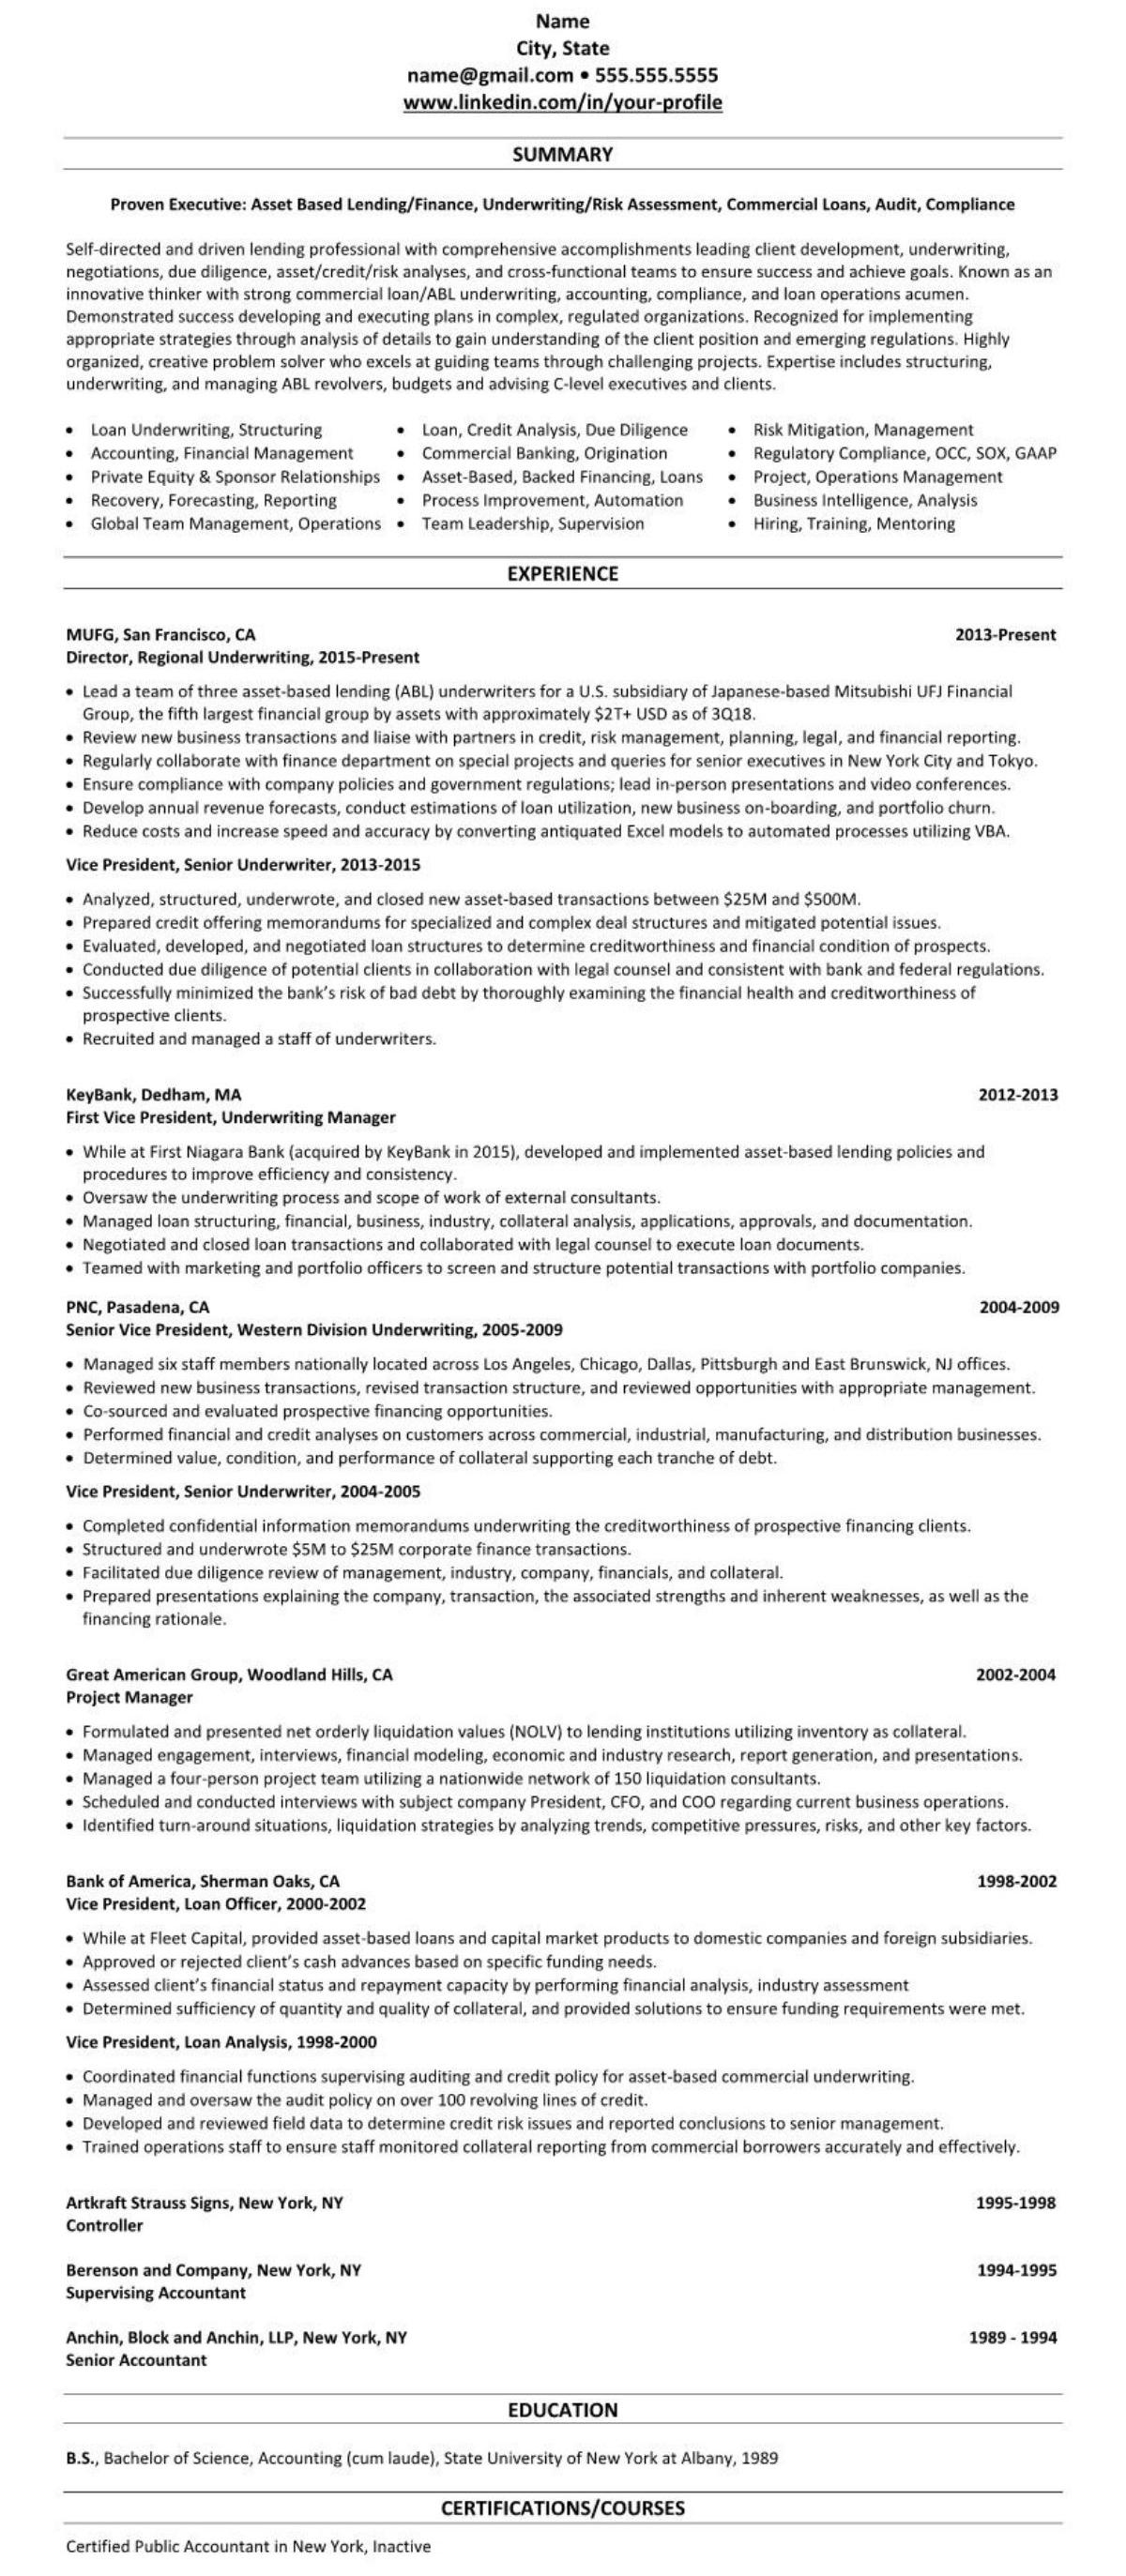 Mortgage Broker Banking Resume 2366